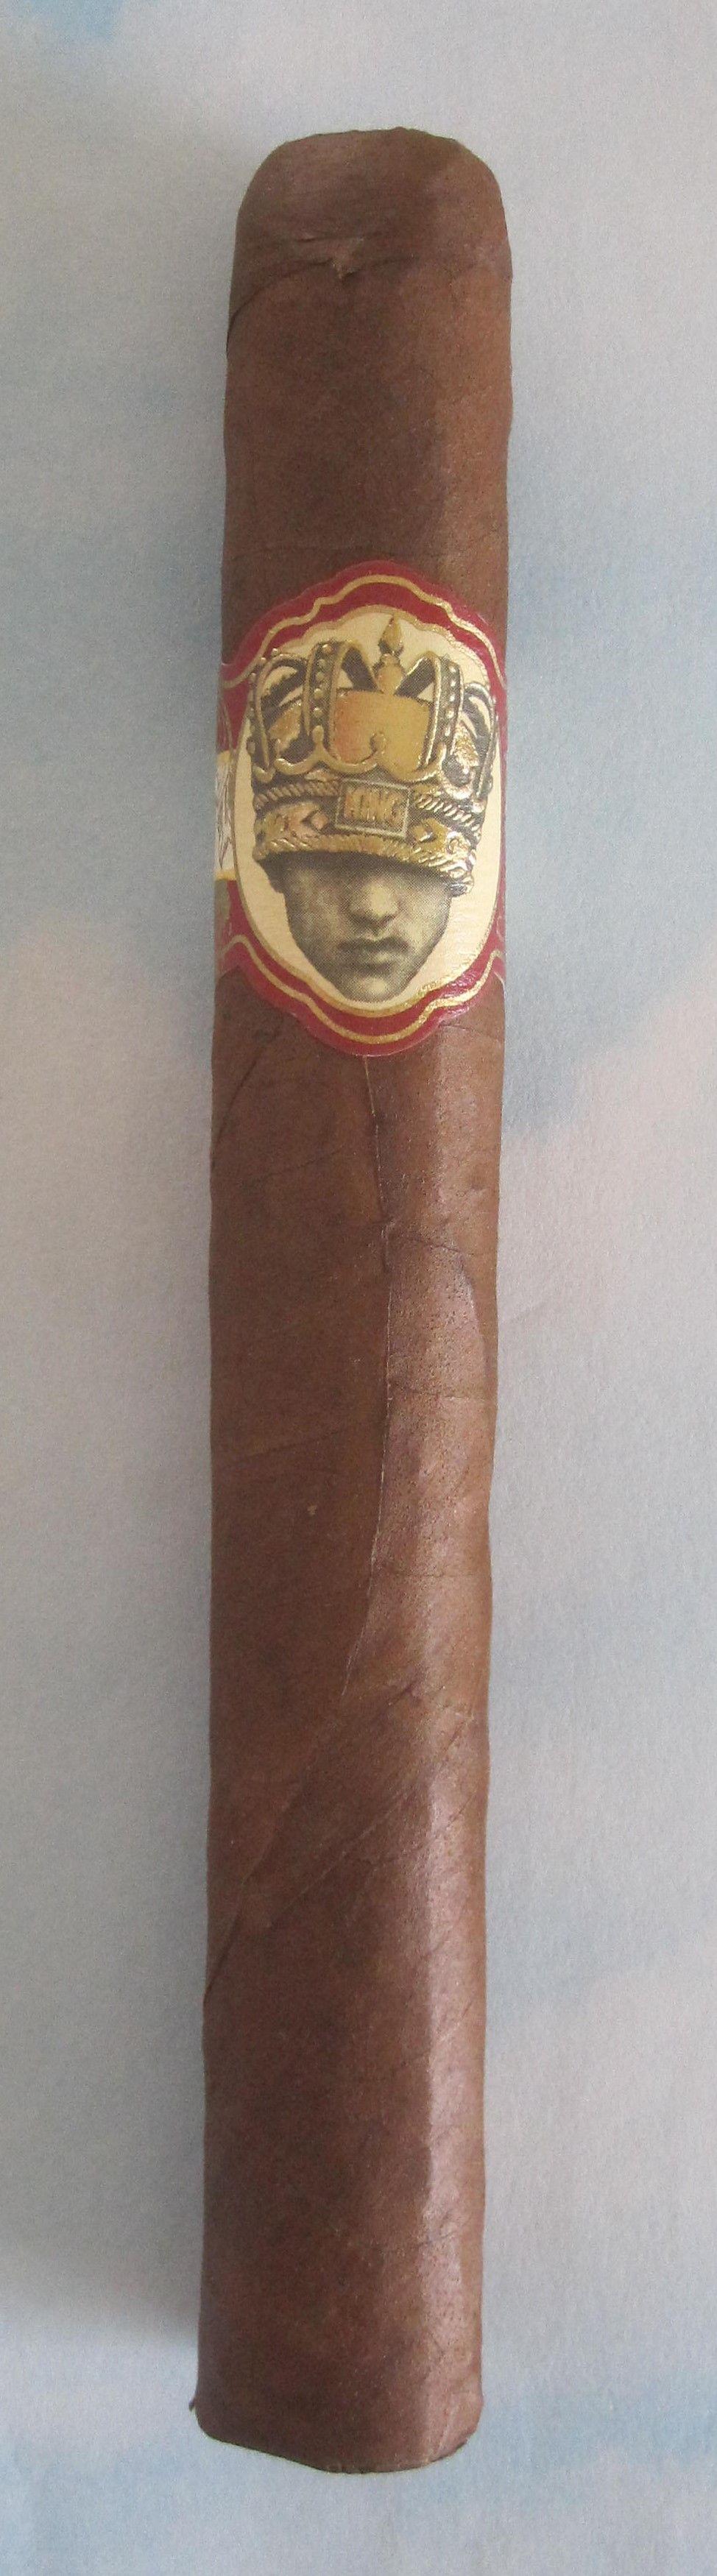 Caldwell Long Live the King Cigar